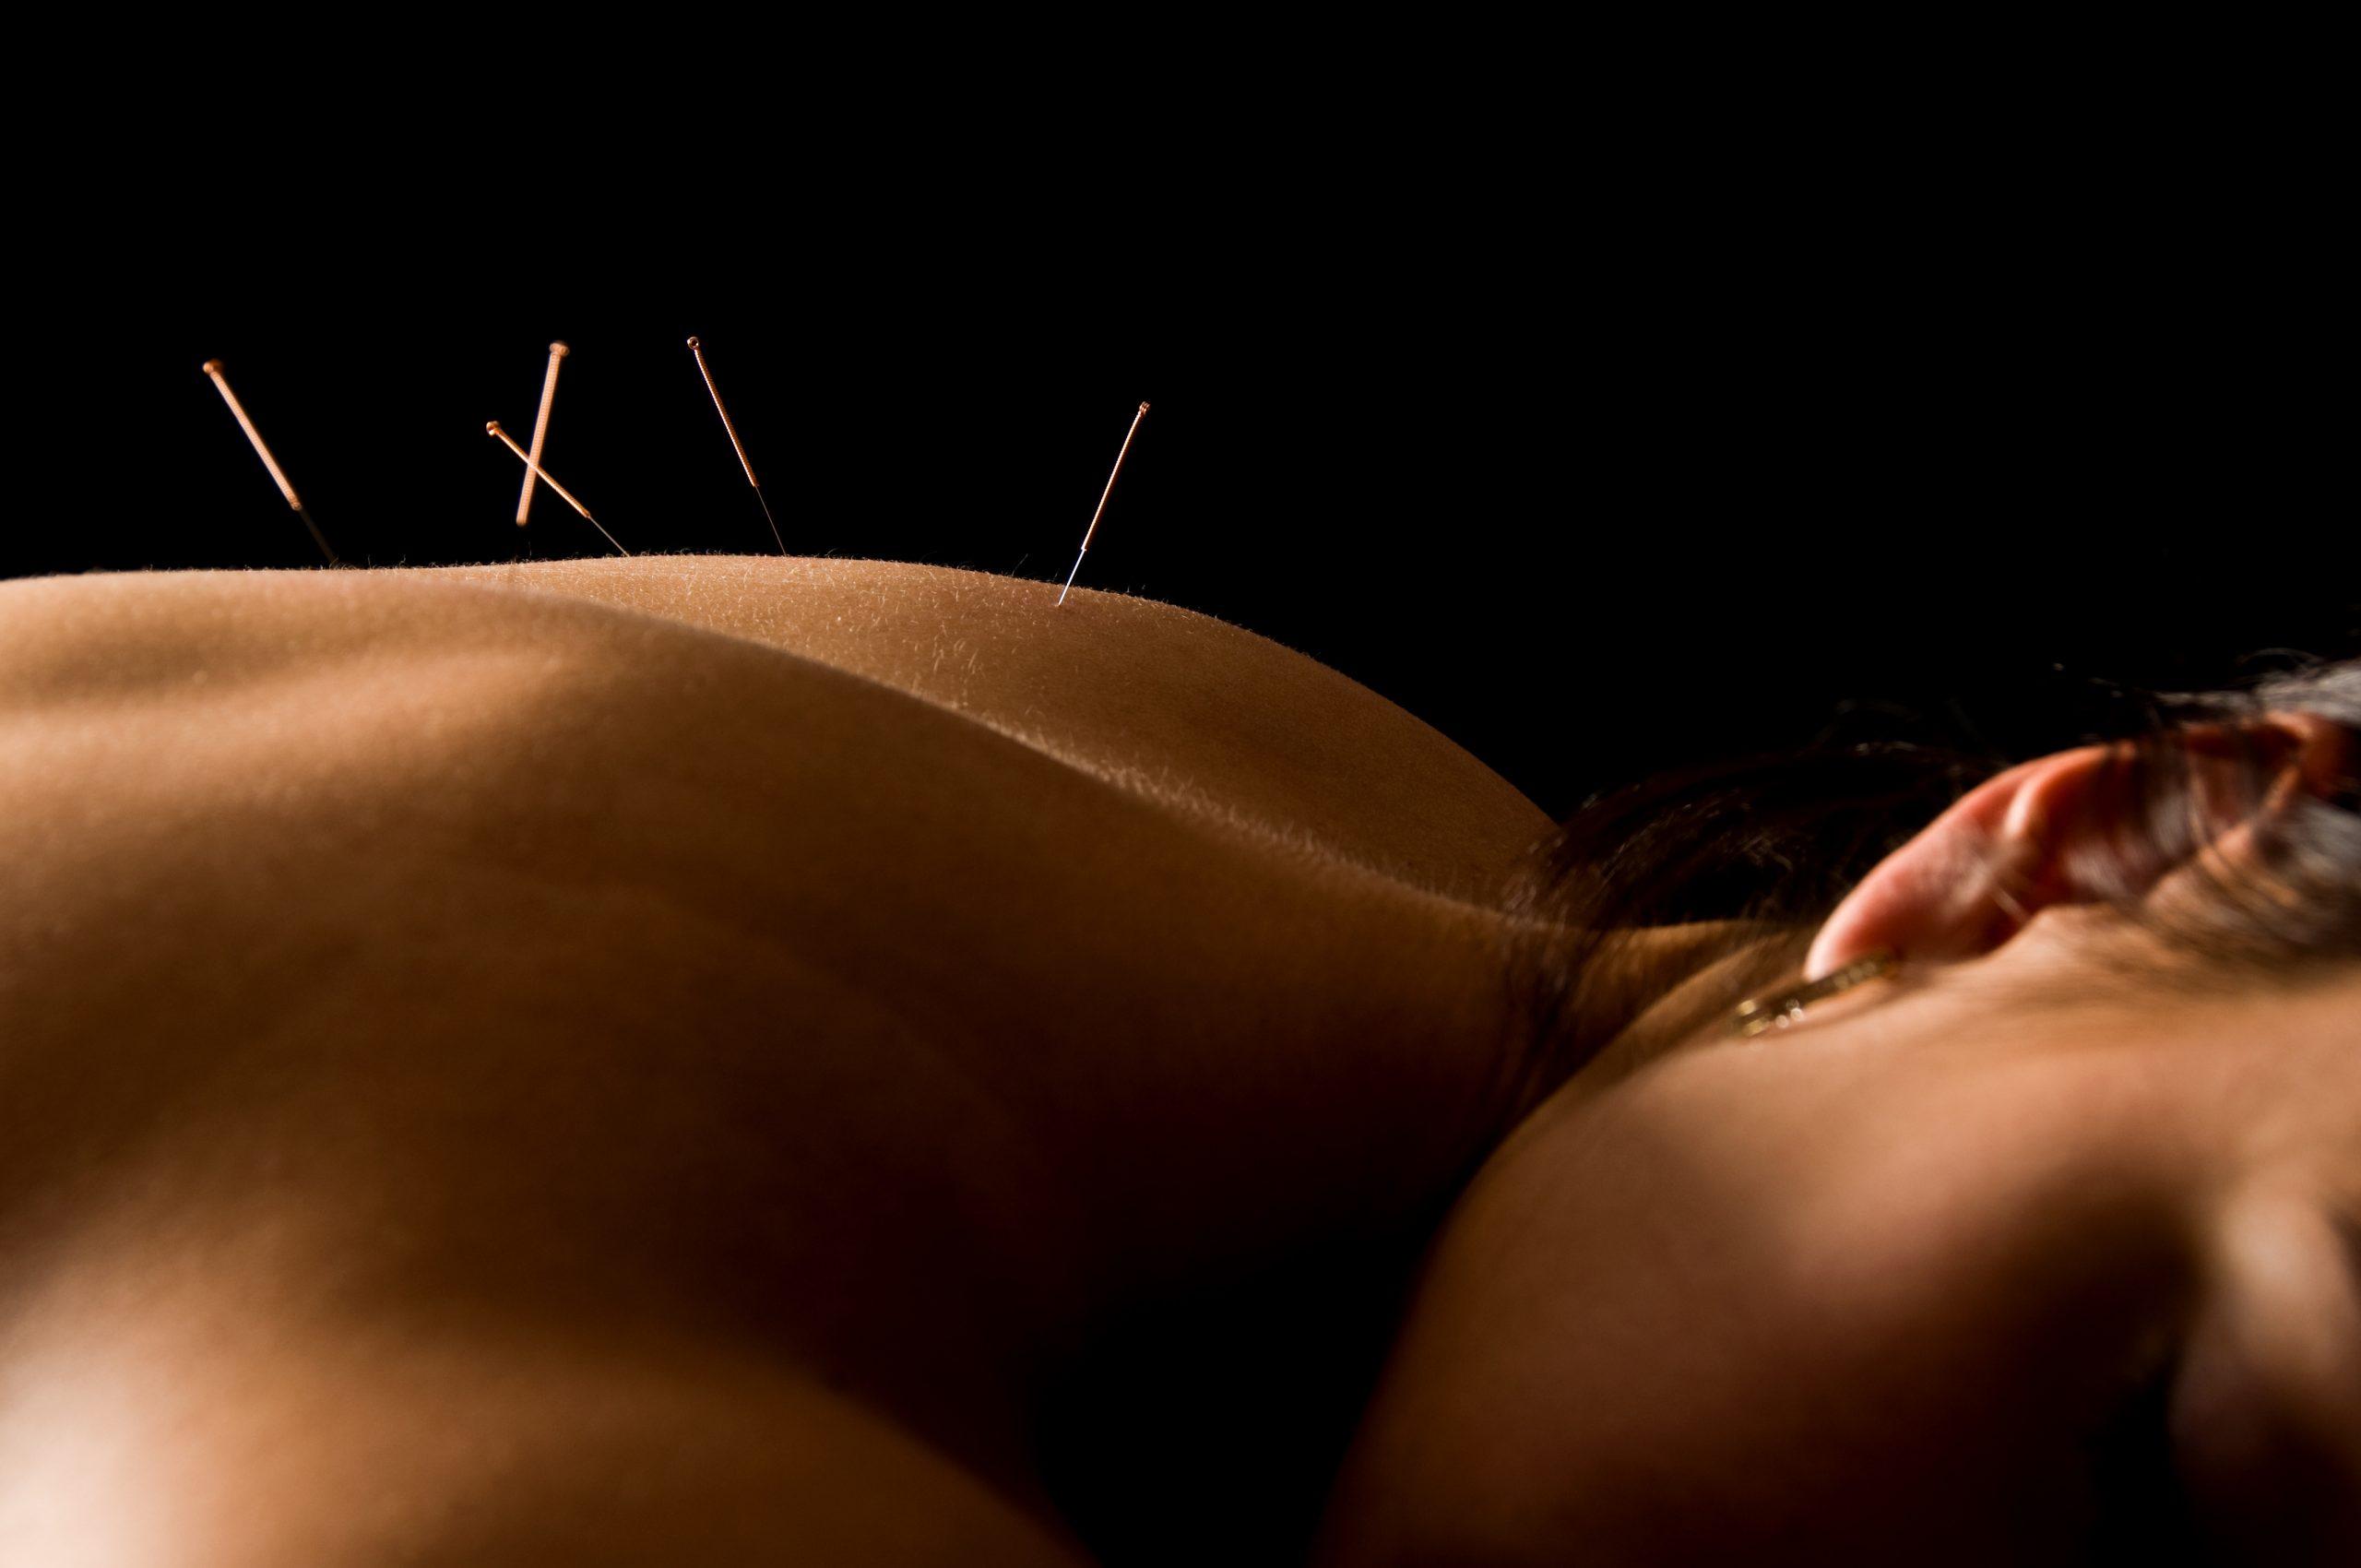 Praticienne médecine traditionnelle chinoise Tours: Acupuncture traditionnelle chinoise à Tours